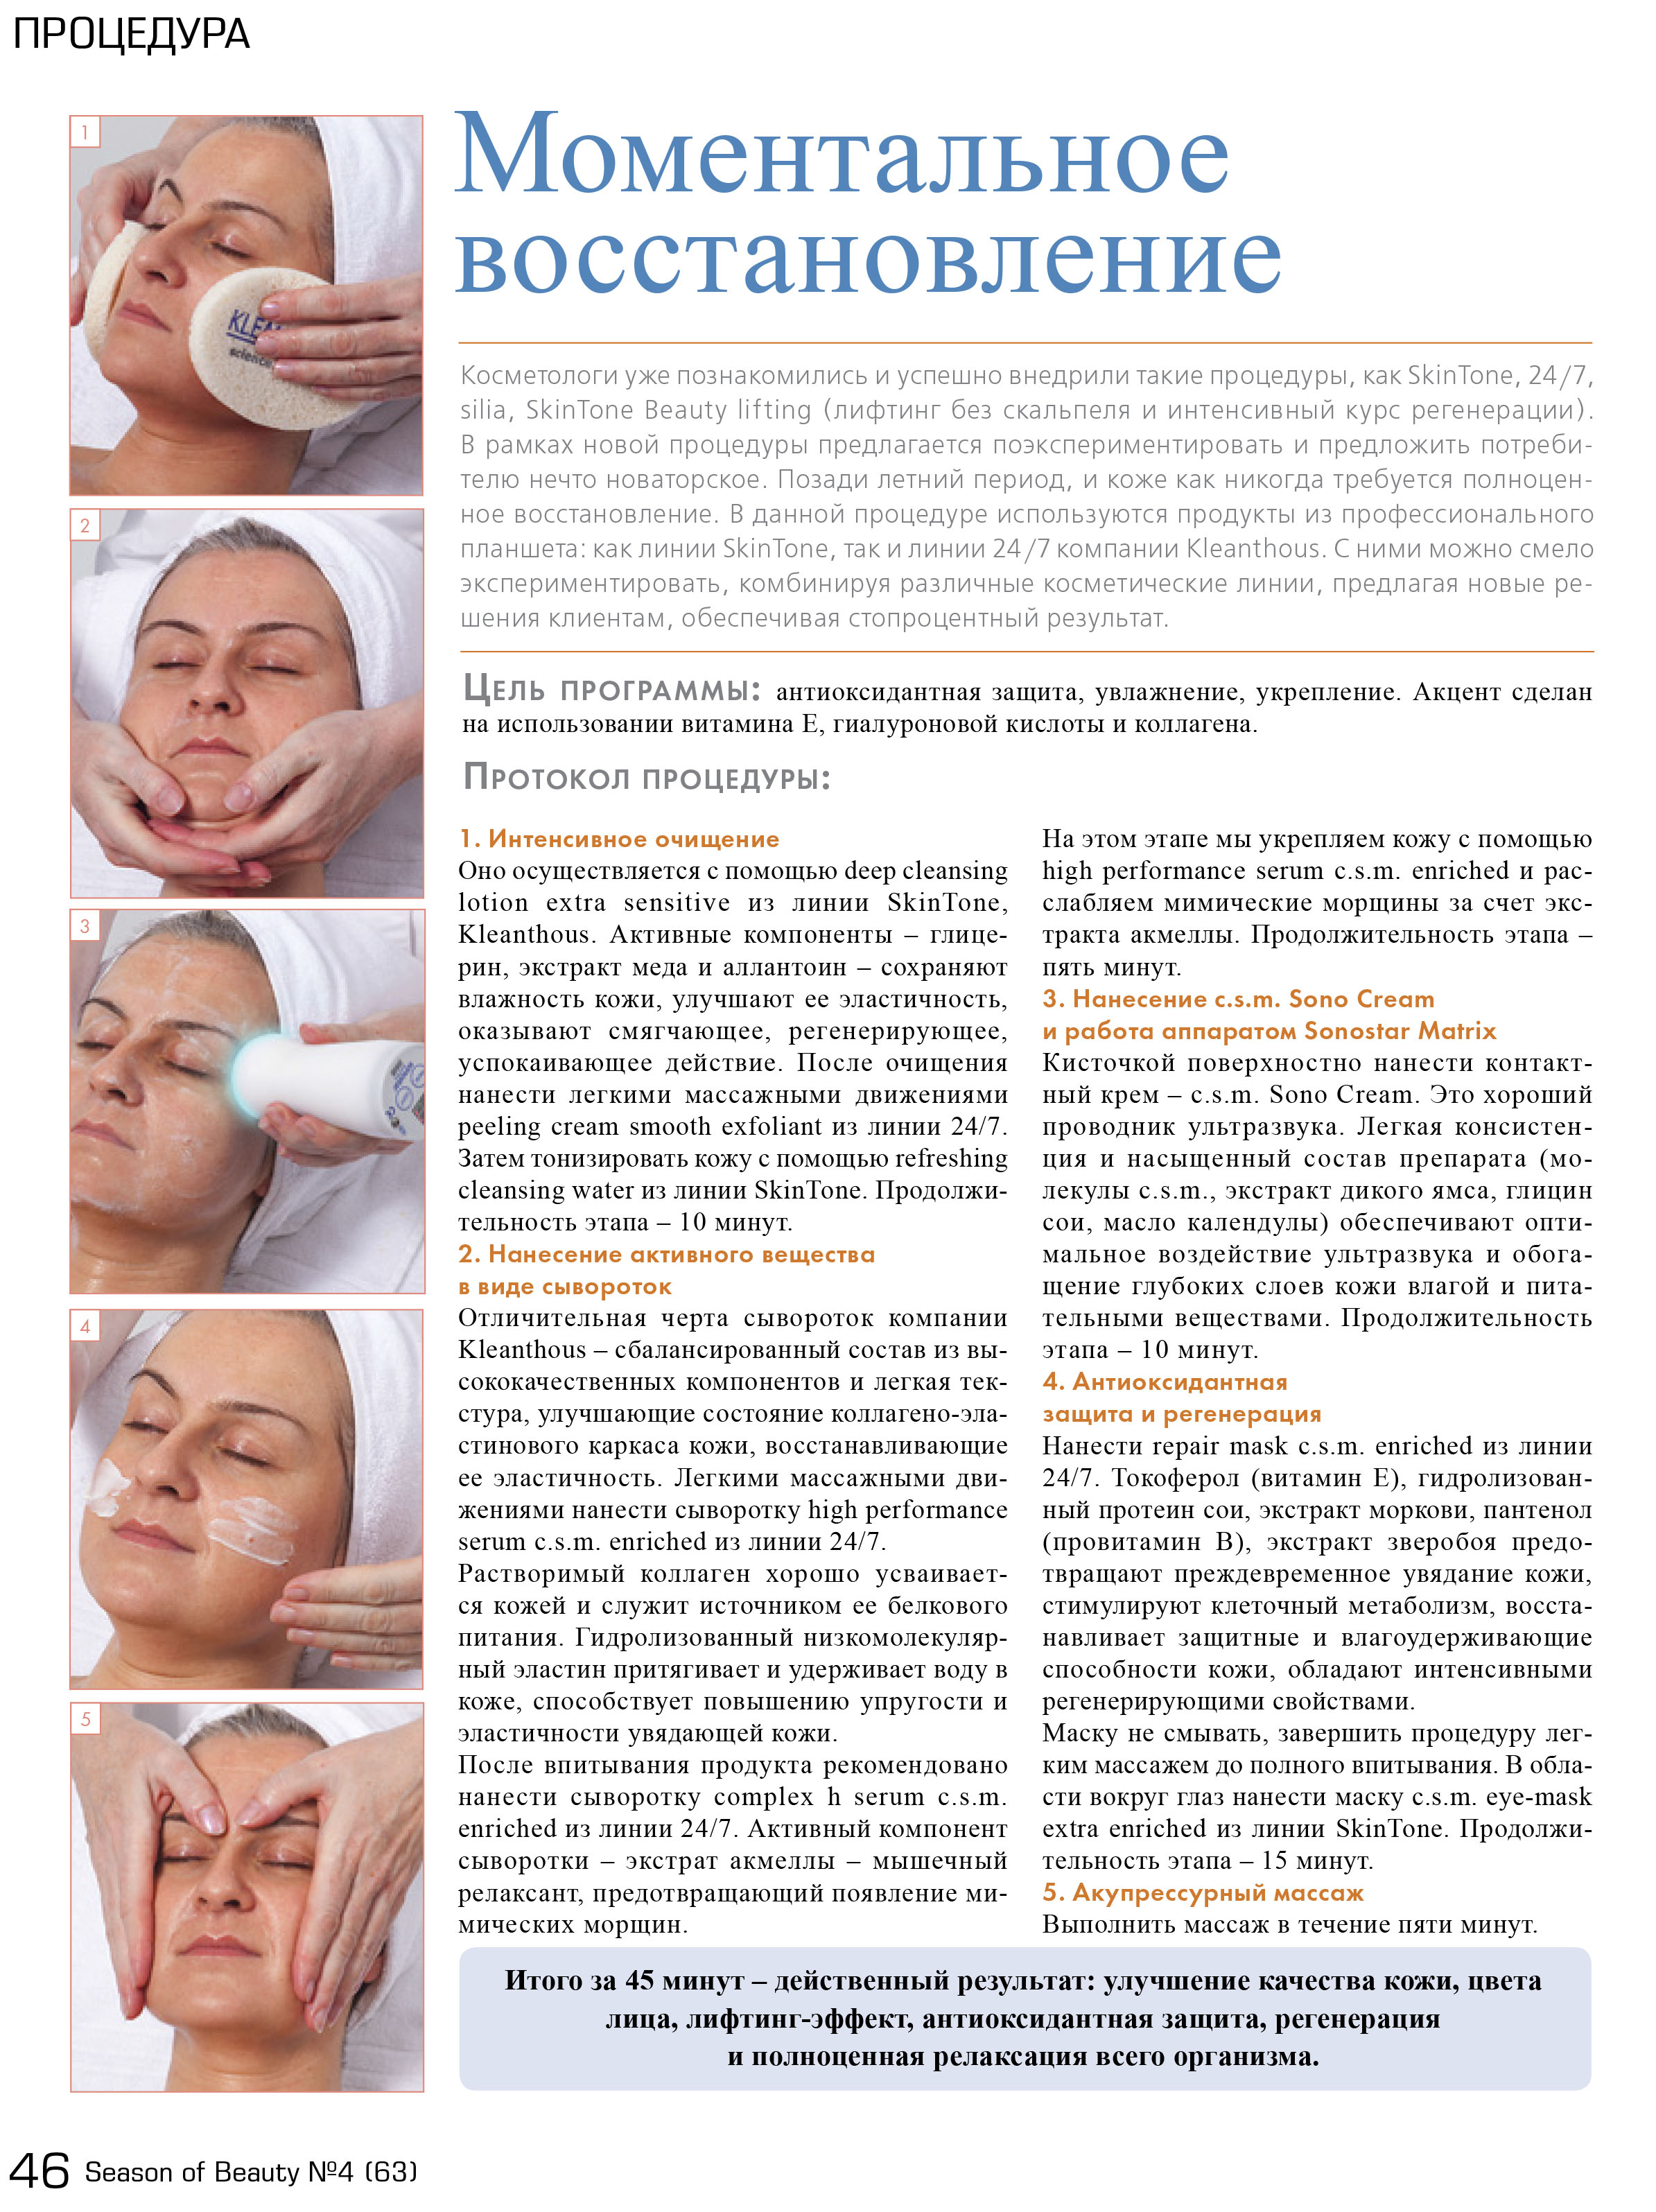 _procedura_avantage_№4(63)-1